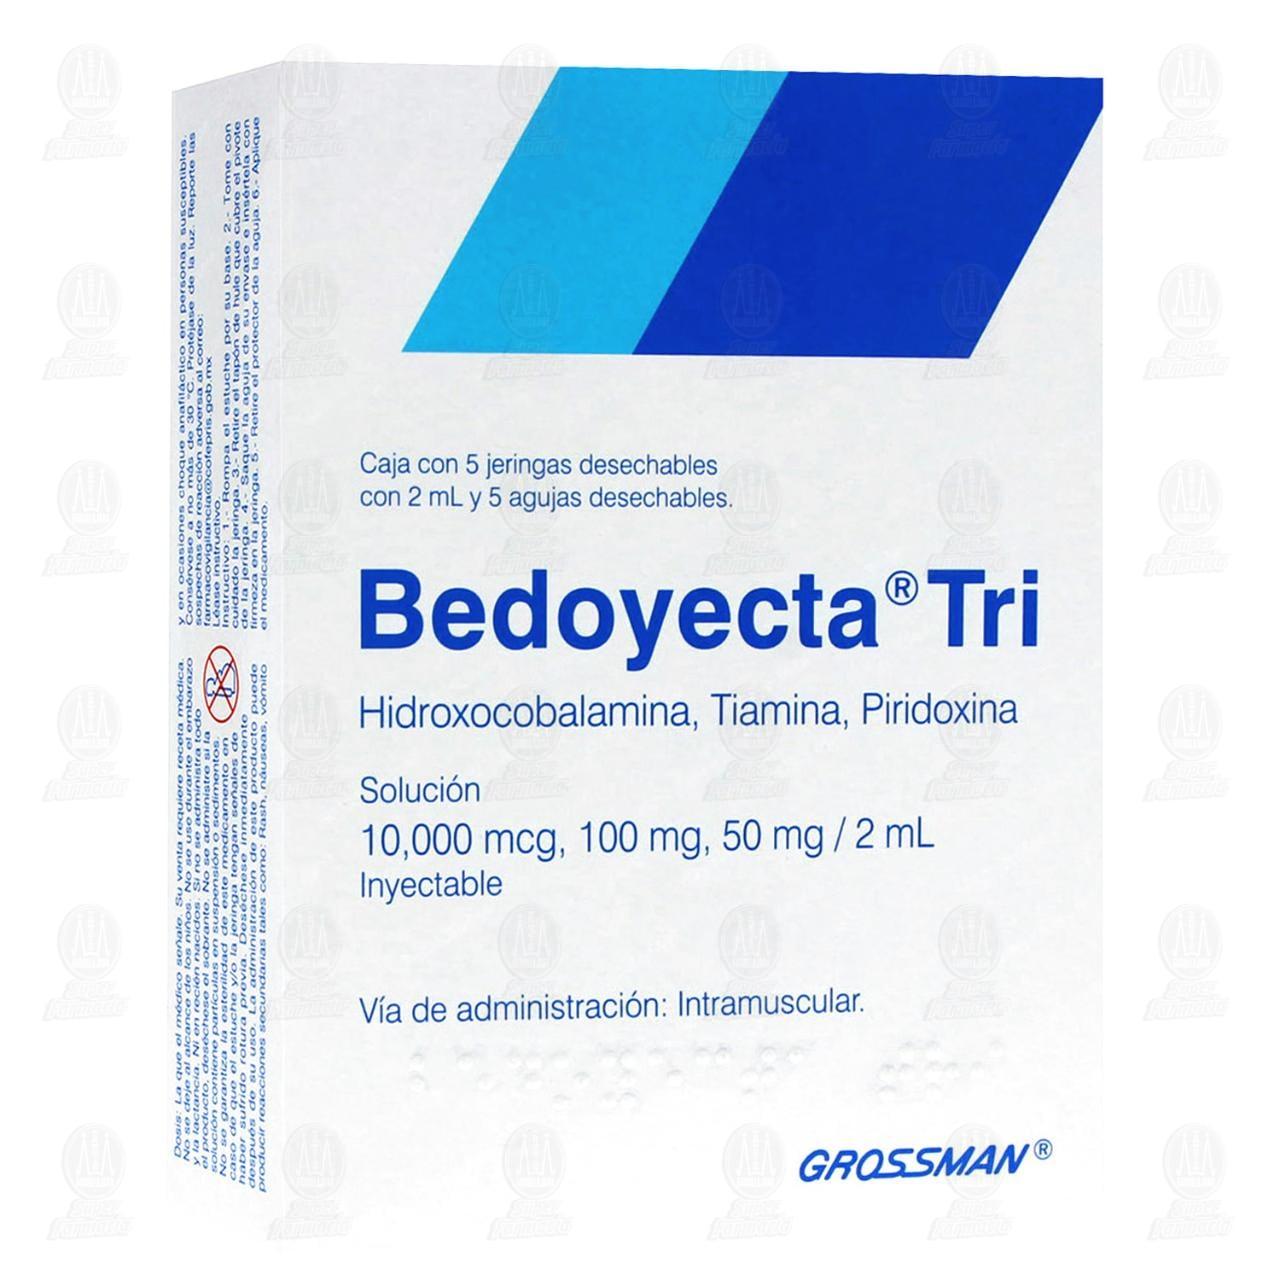 Comprar Bedoyecta Tri 10,000mcg, 100mg, 50mg, 2ml 5 Jeringas con 2ml en Farmacias Guadalajara